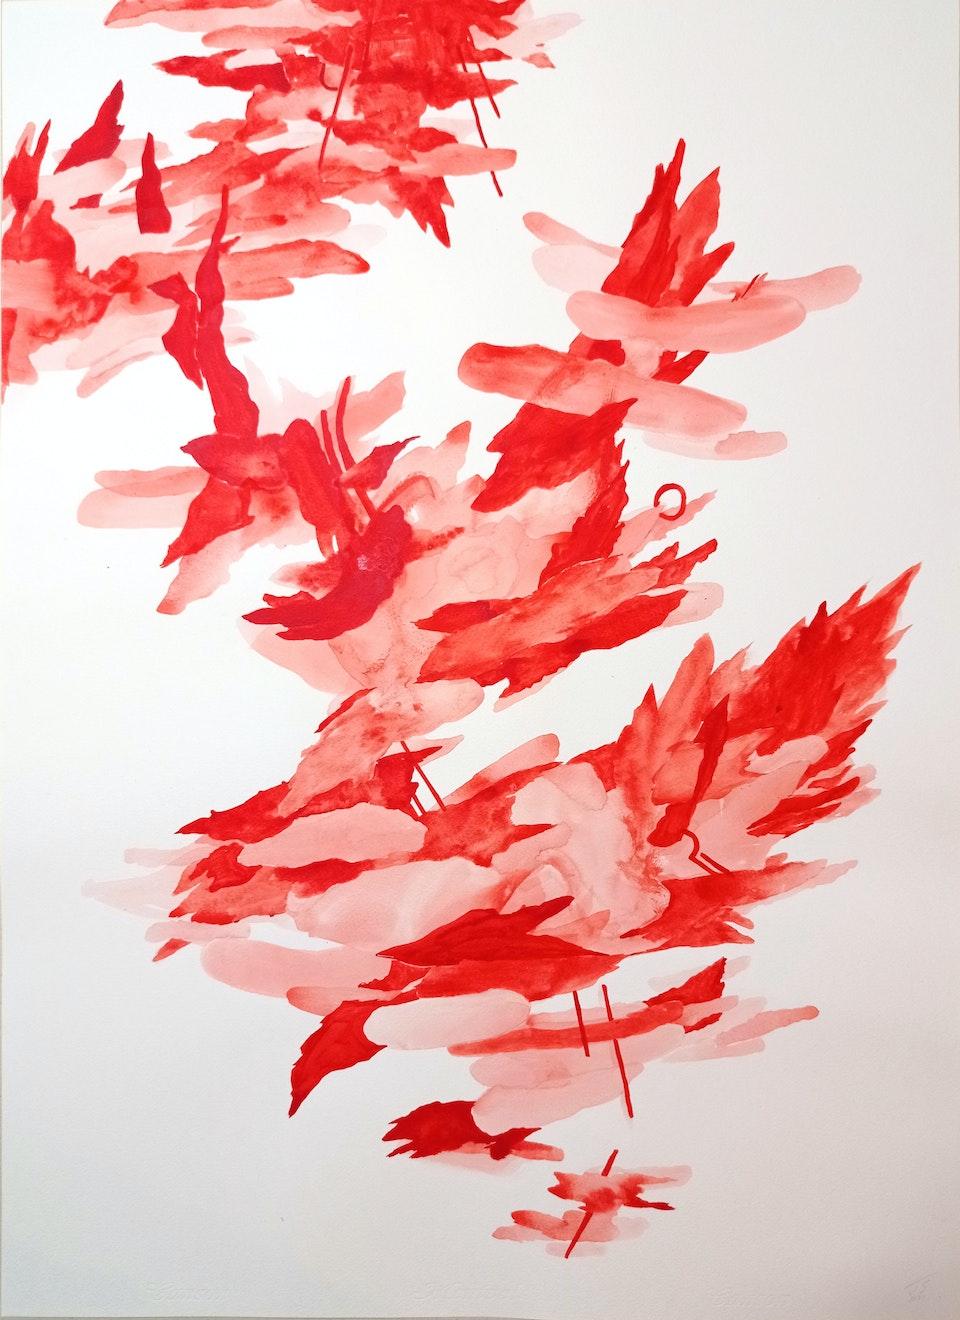 Blaze I_2021_Justin Southey - Justin Southey 2021 Blaze I Acrylic ink on paper 75cm x 55cm ZAR 20 500